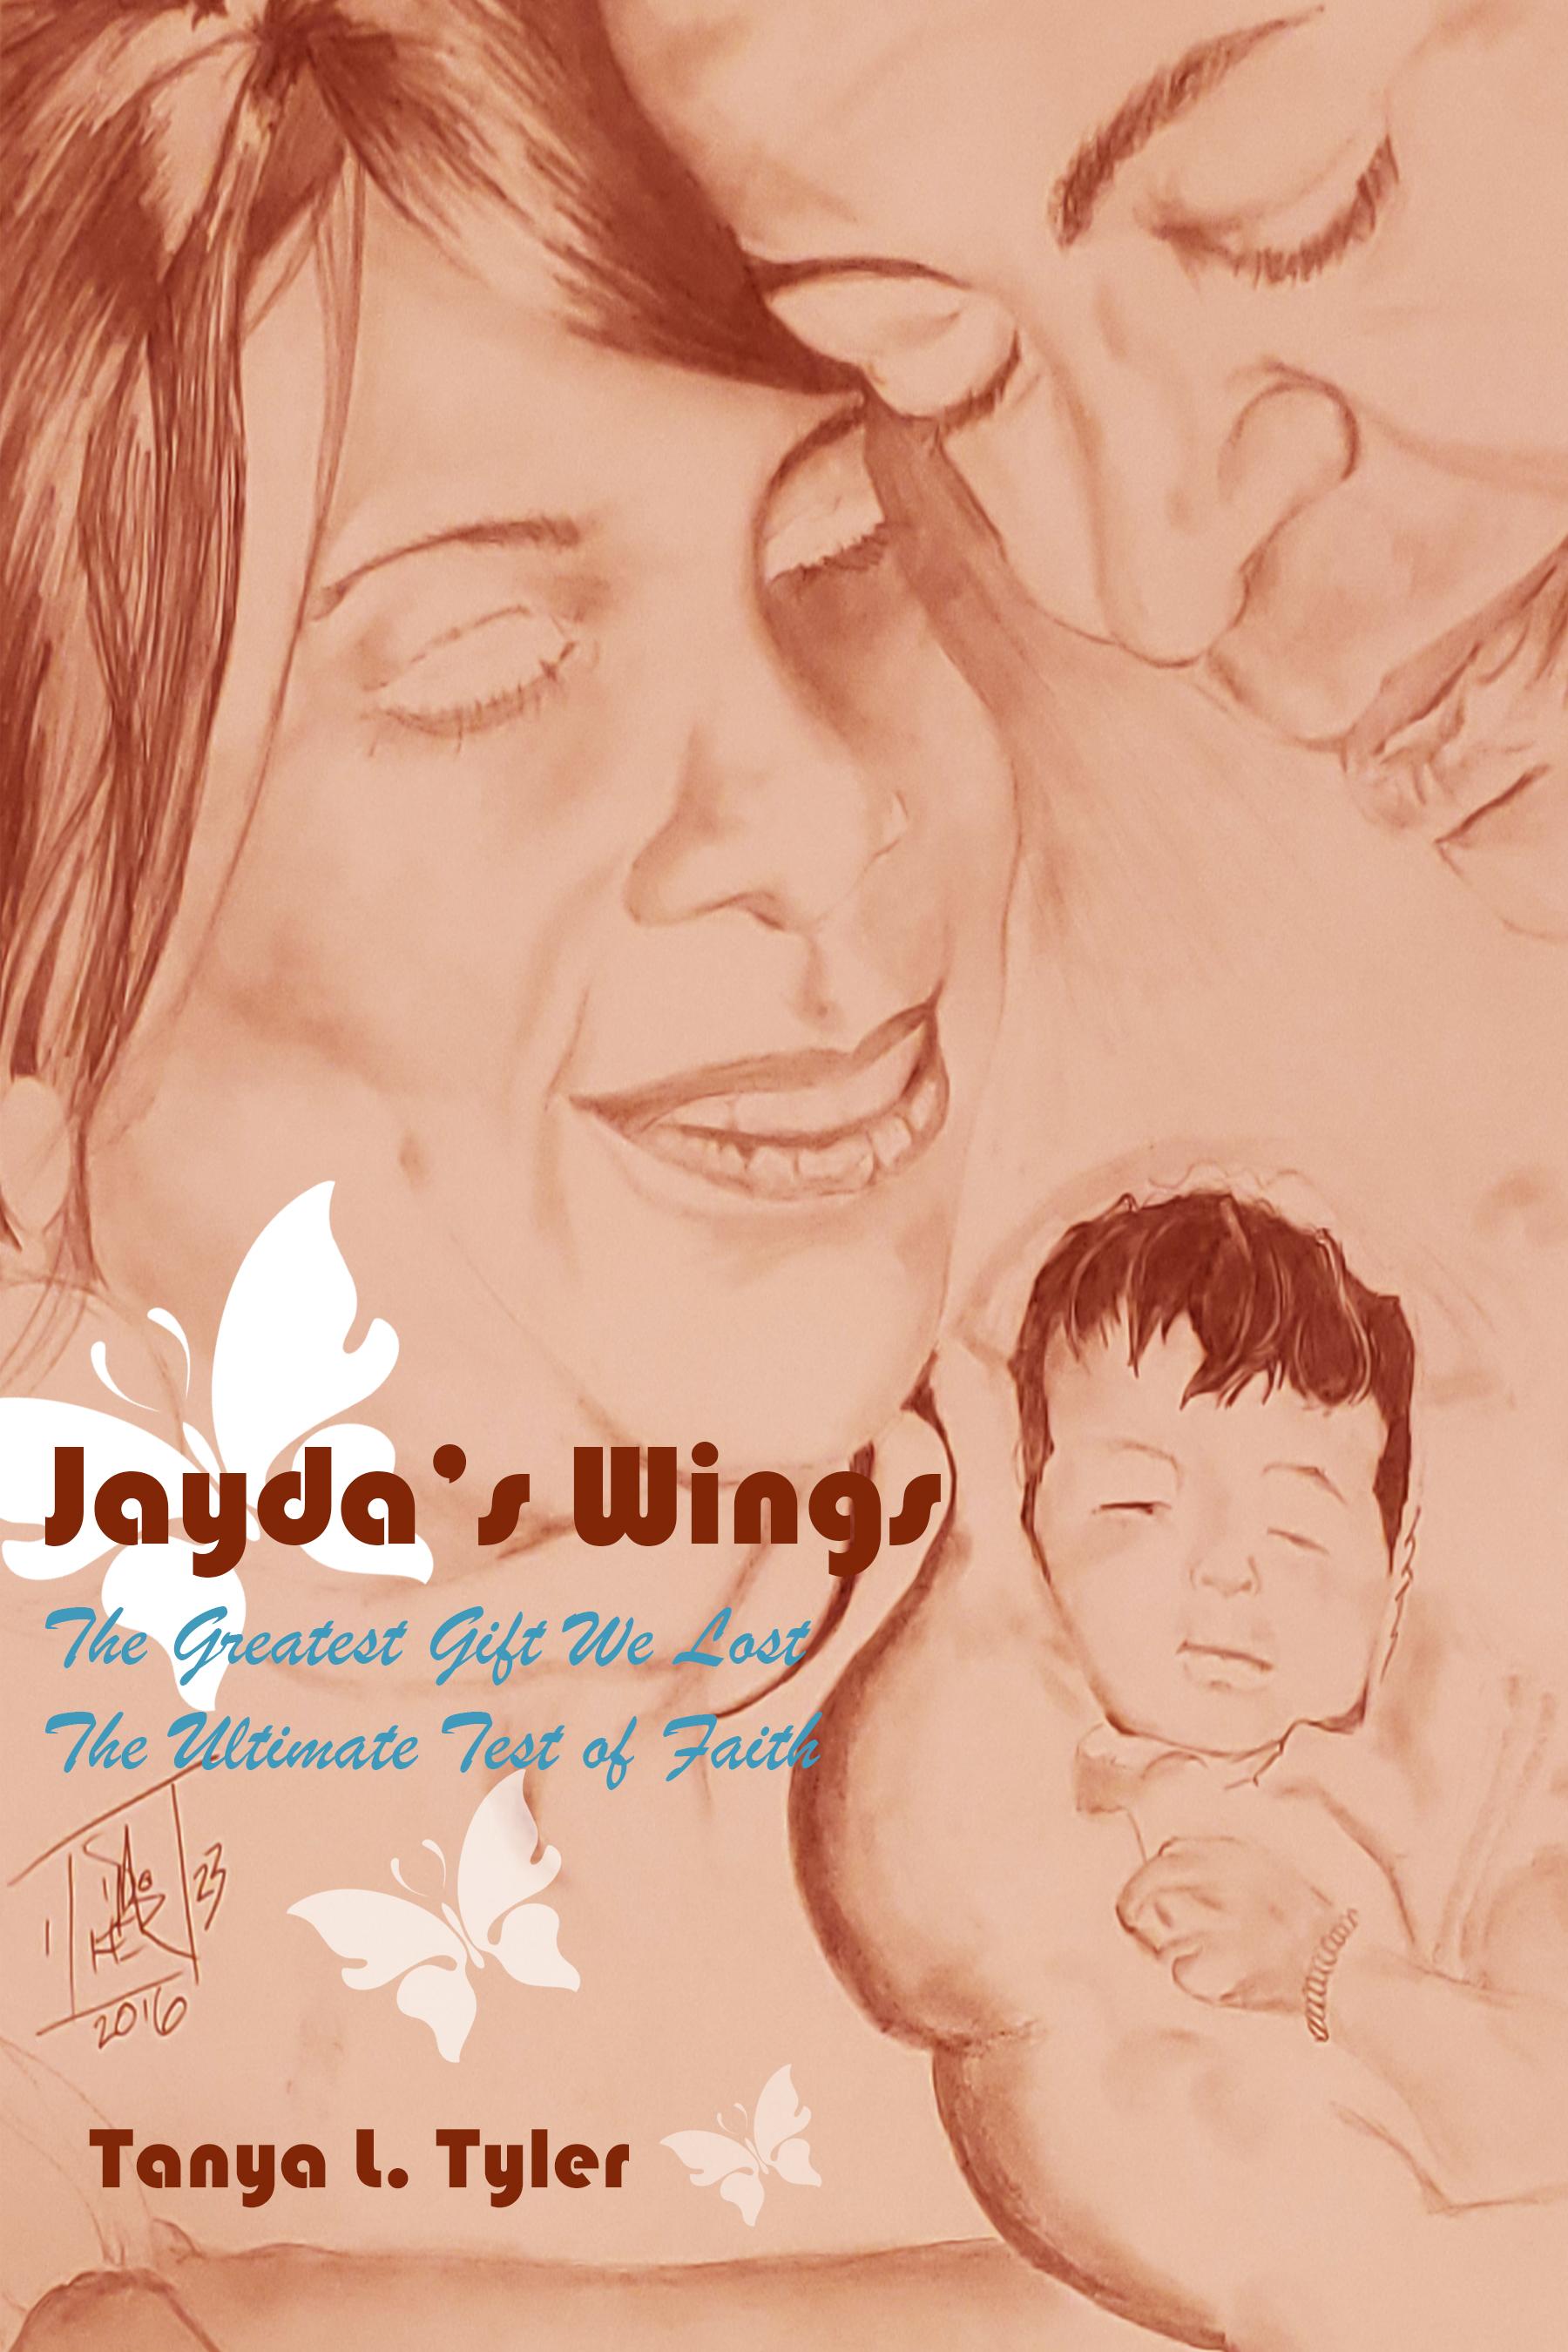 BOOK RELEASE - JAYDA\'S WINGS by Tanya L. Tyler